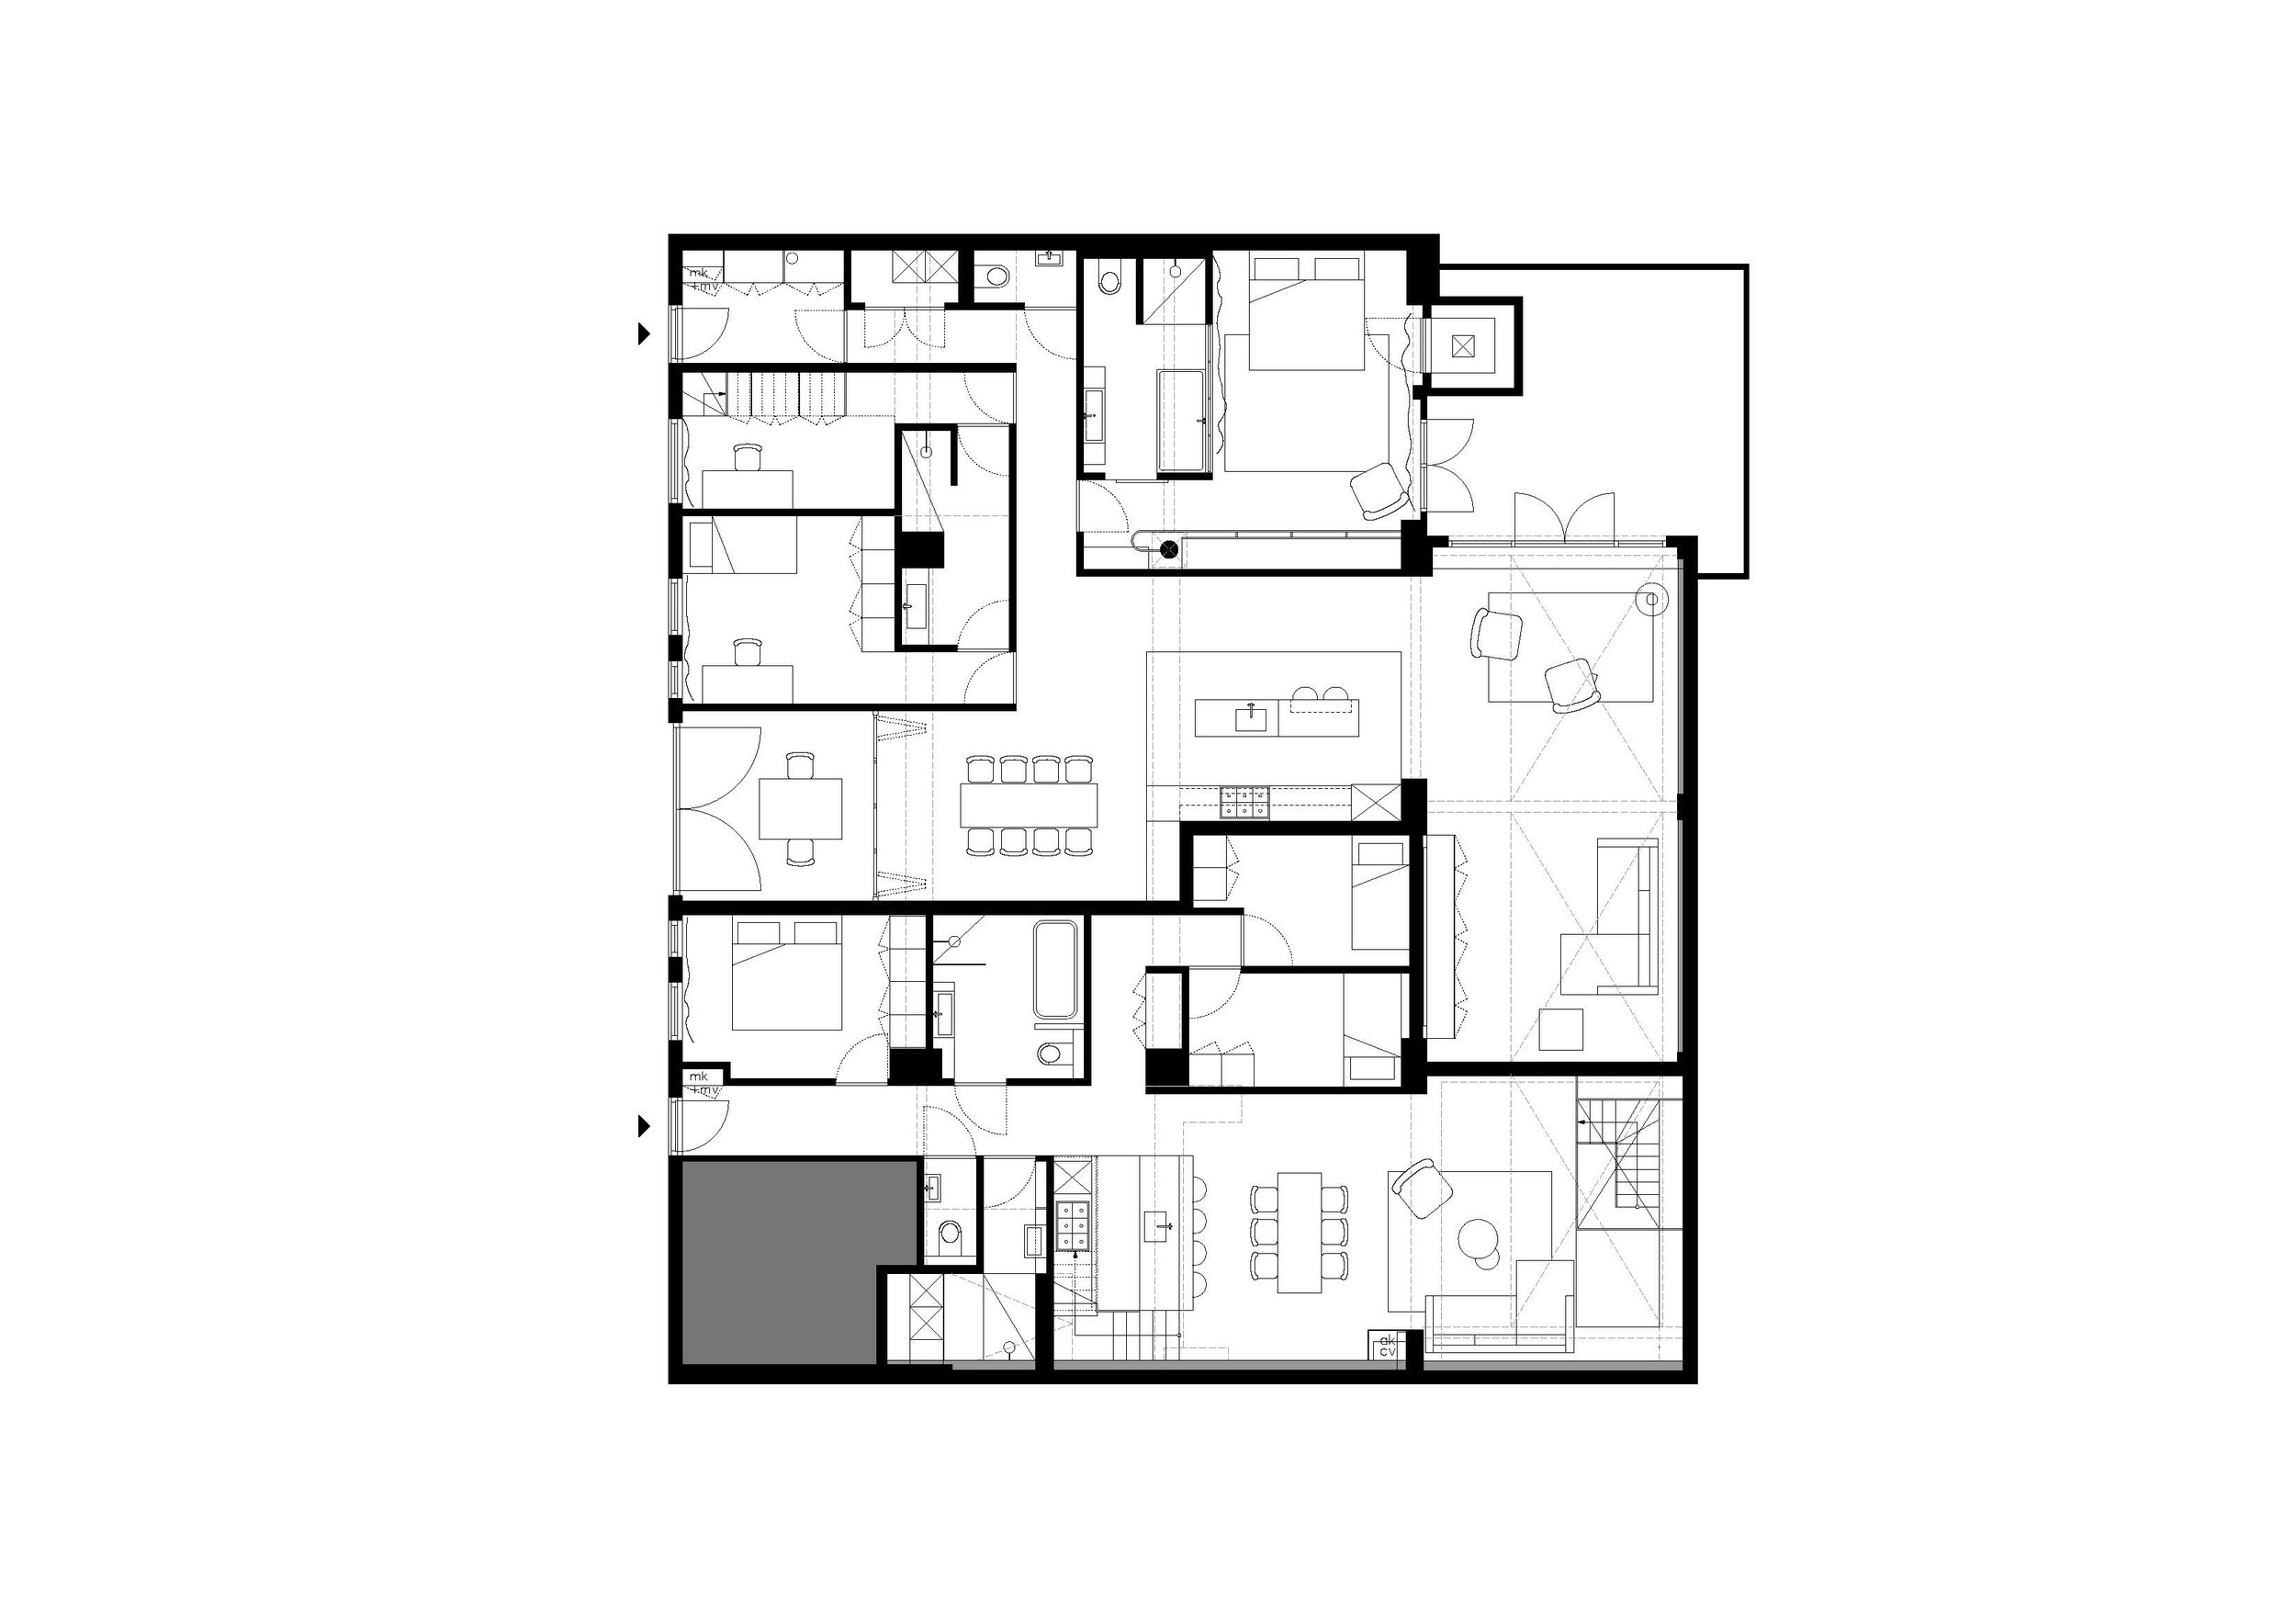 Woonhuis Sint Willibrordesstraat - PLATTEGROND APT 1&2.jpg